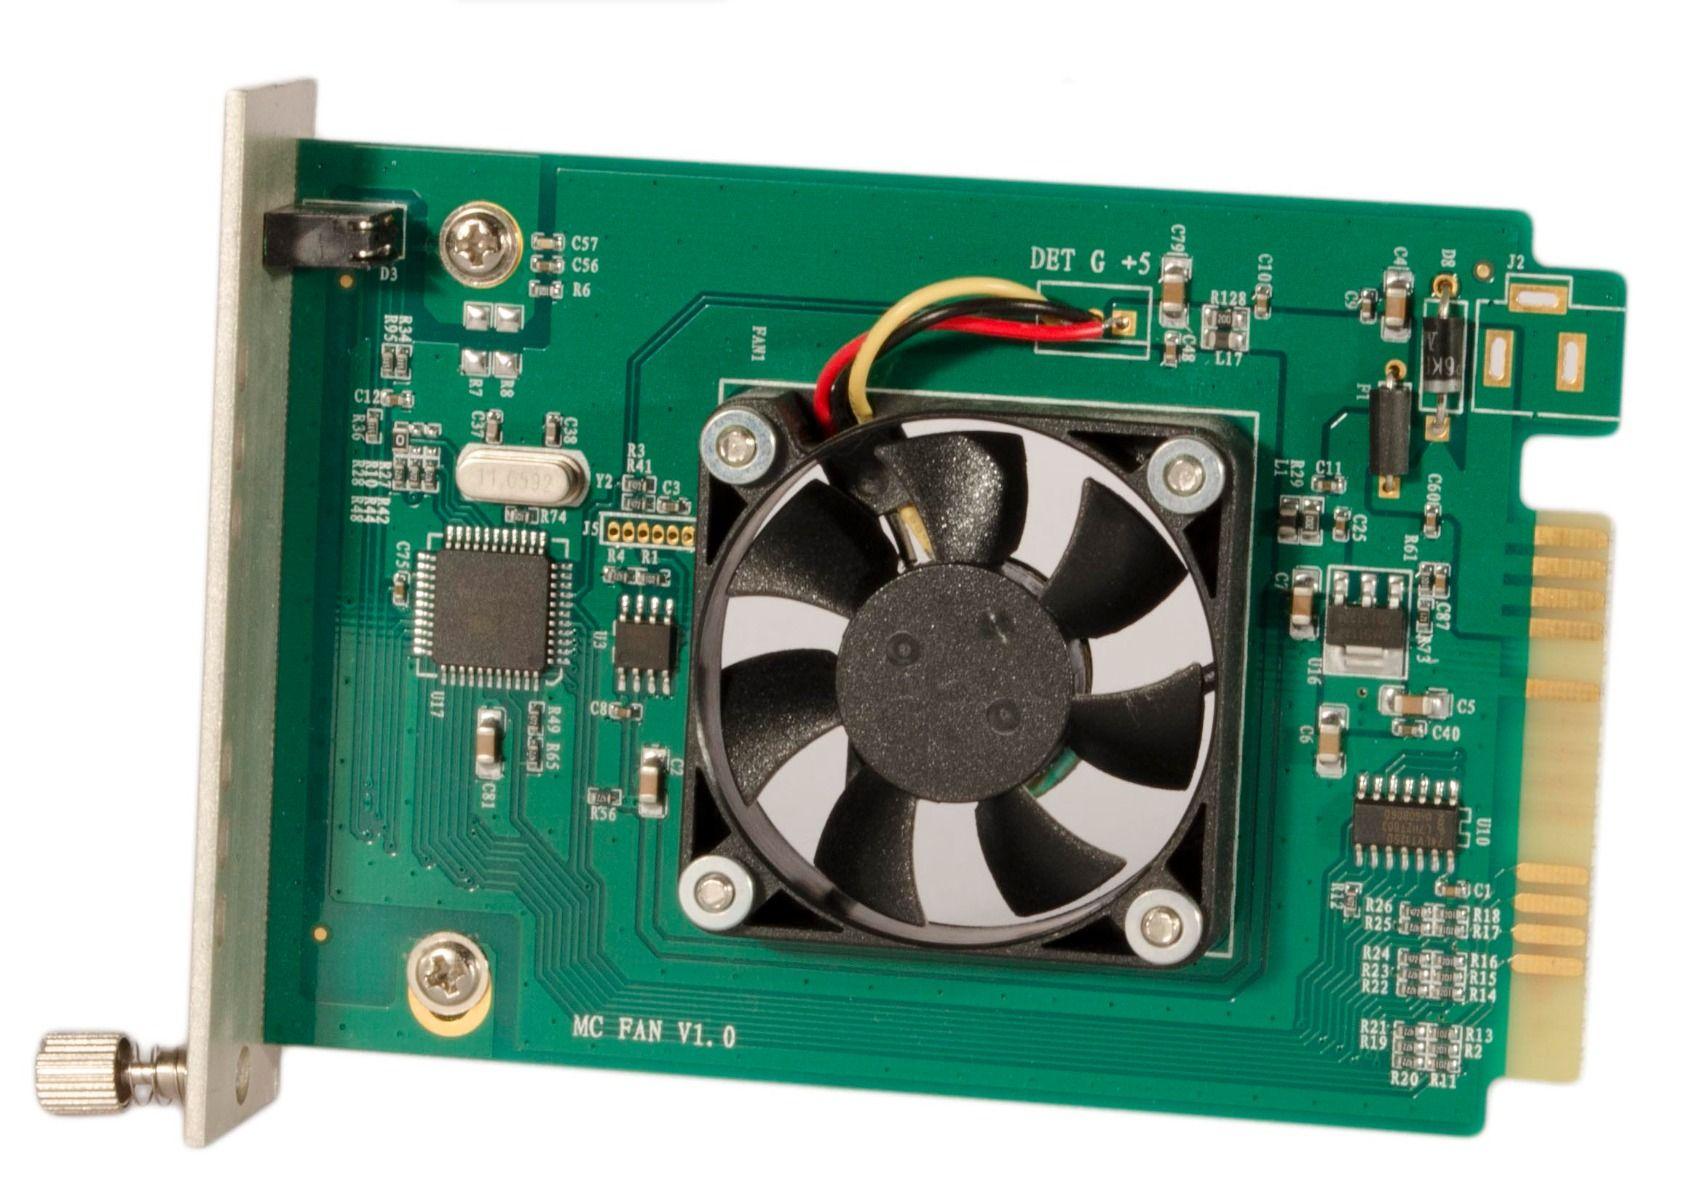 10G Fiber Media Converter Card – SFP+ and RJ45 Ports